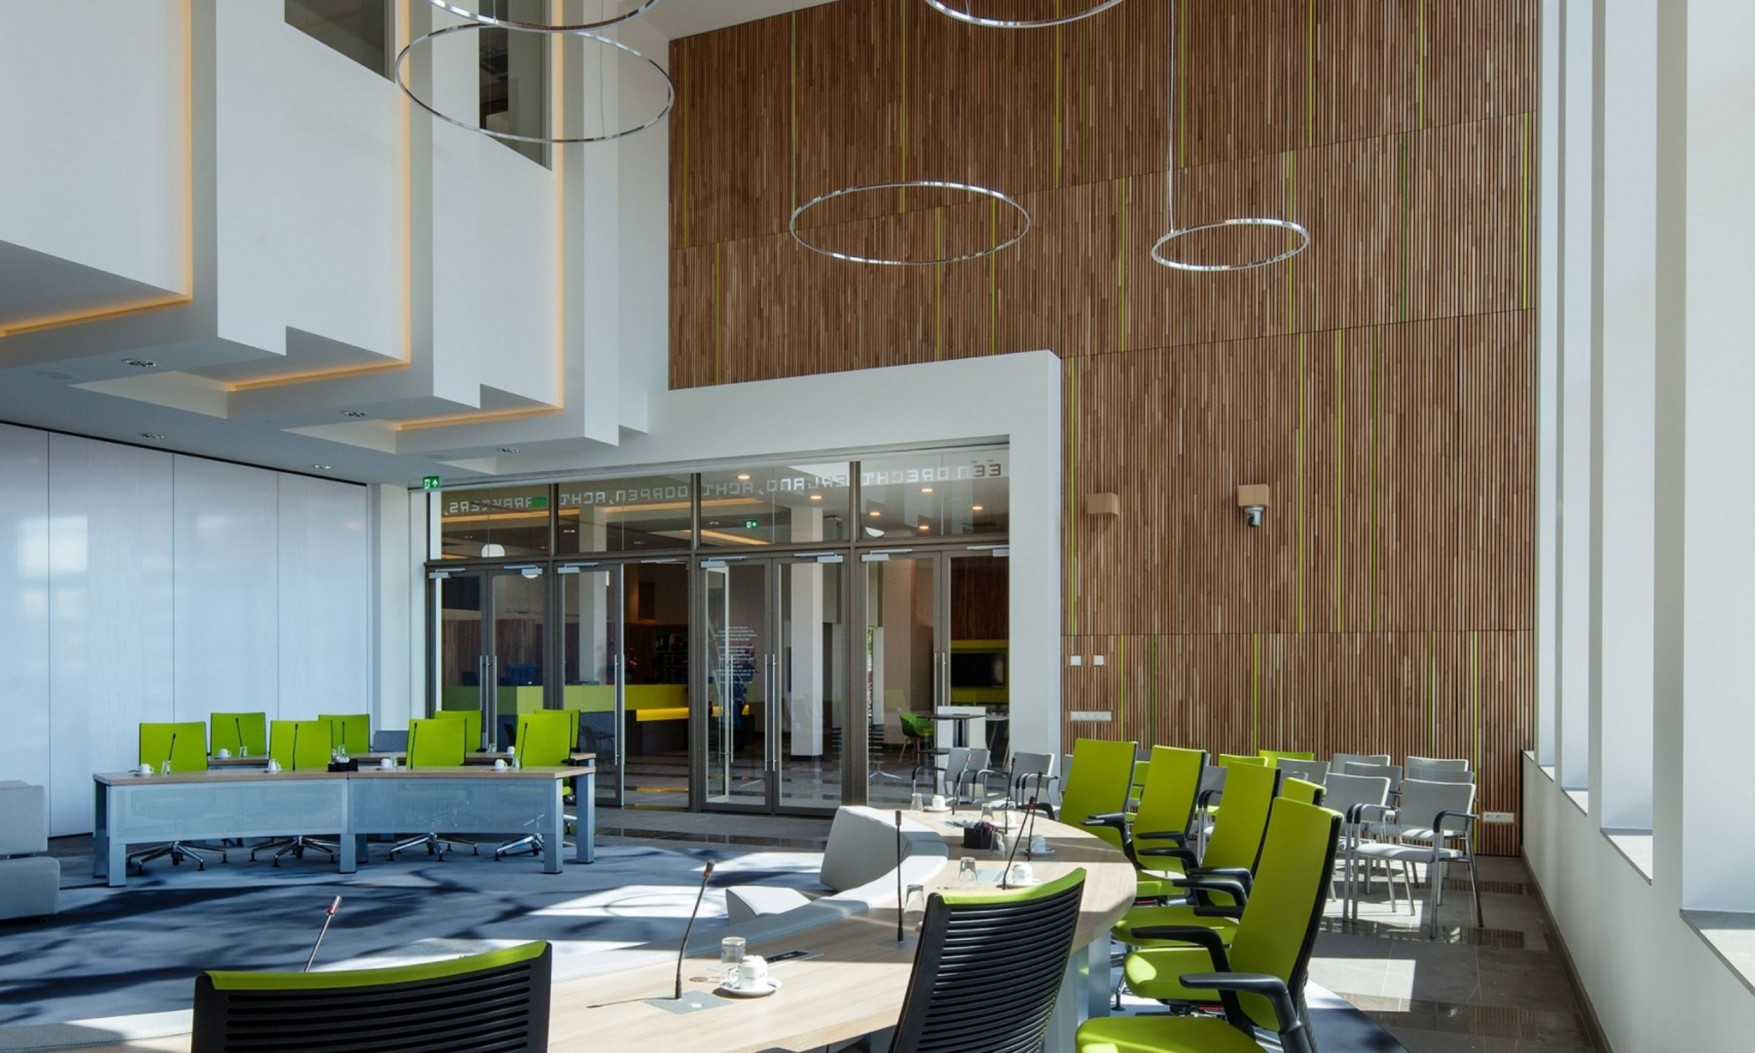 Harryvan Interieurbouw | latten plafond en wandbekleding (gemeente Drechterland)